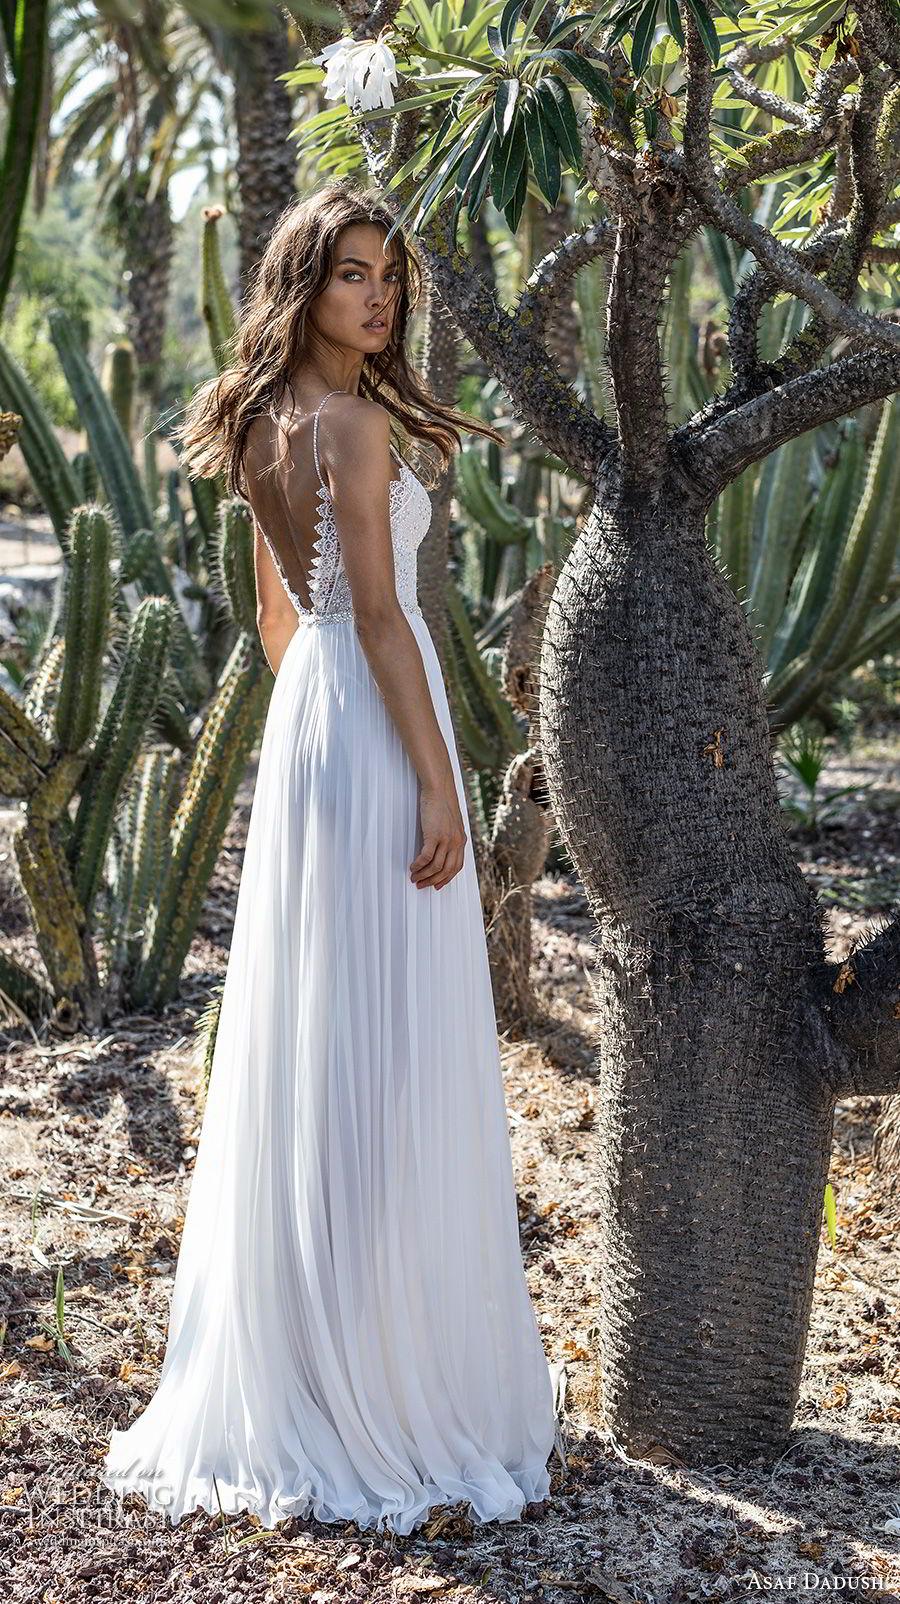 asaf dadush 2018 bridal spaghetti strap sweetheart neckline heavily embellished bodice pleated skirt romantic soft a  line wedding dress open back sweep train (6) bv